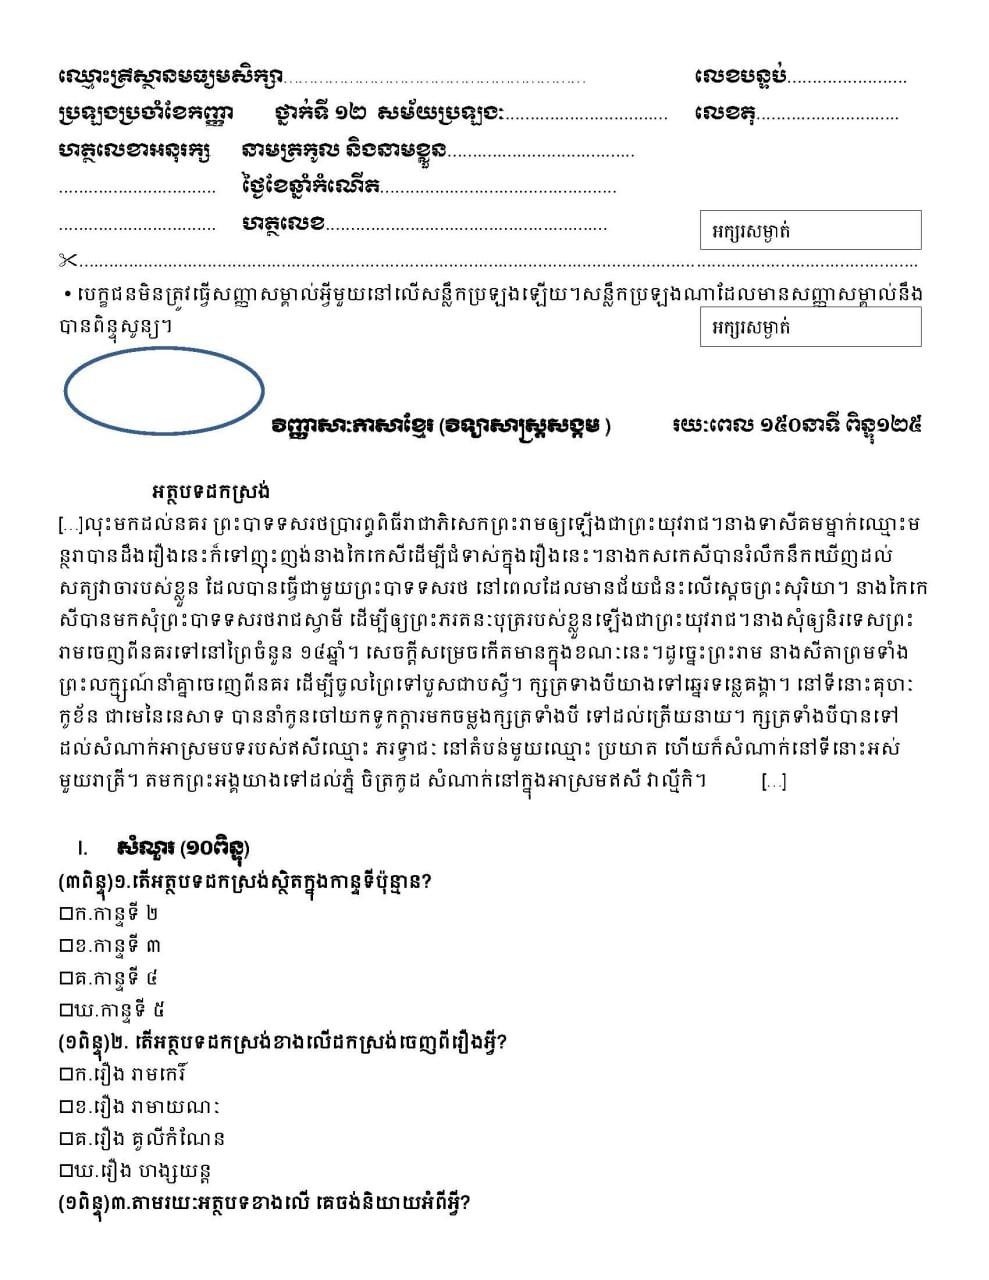 IMG_20211003_202621_057